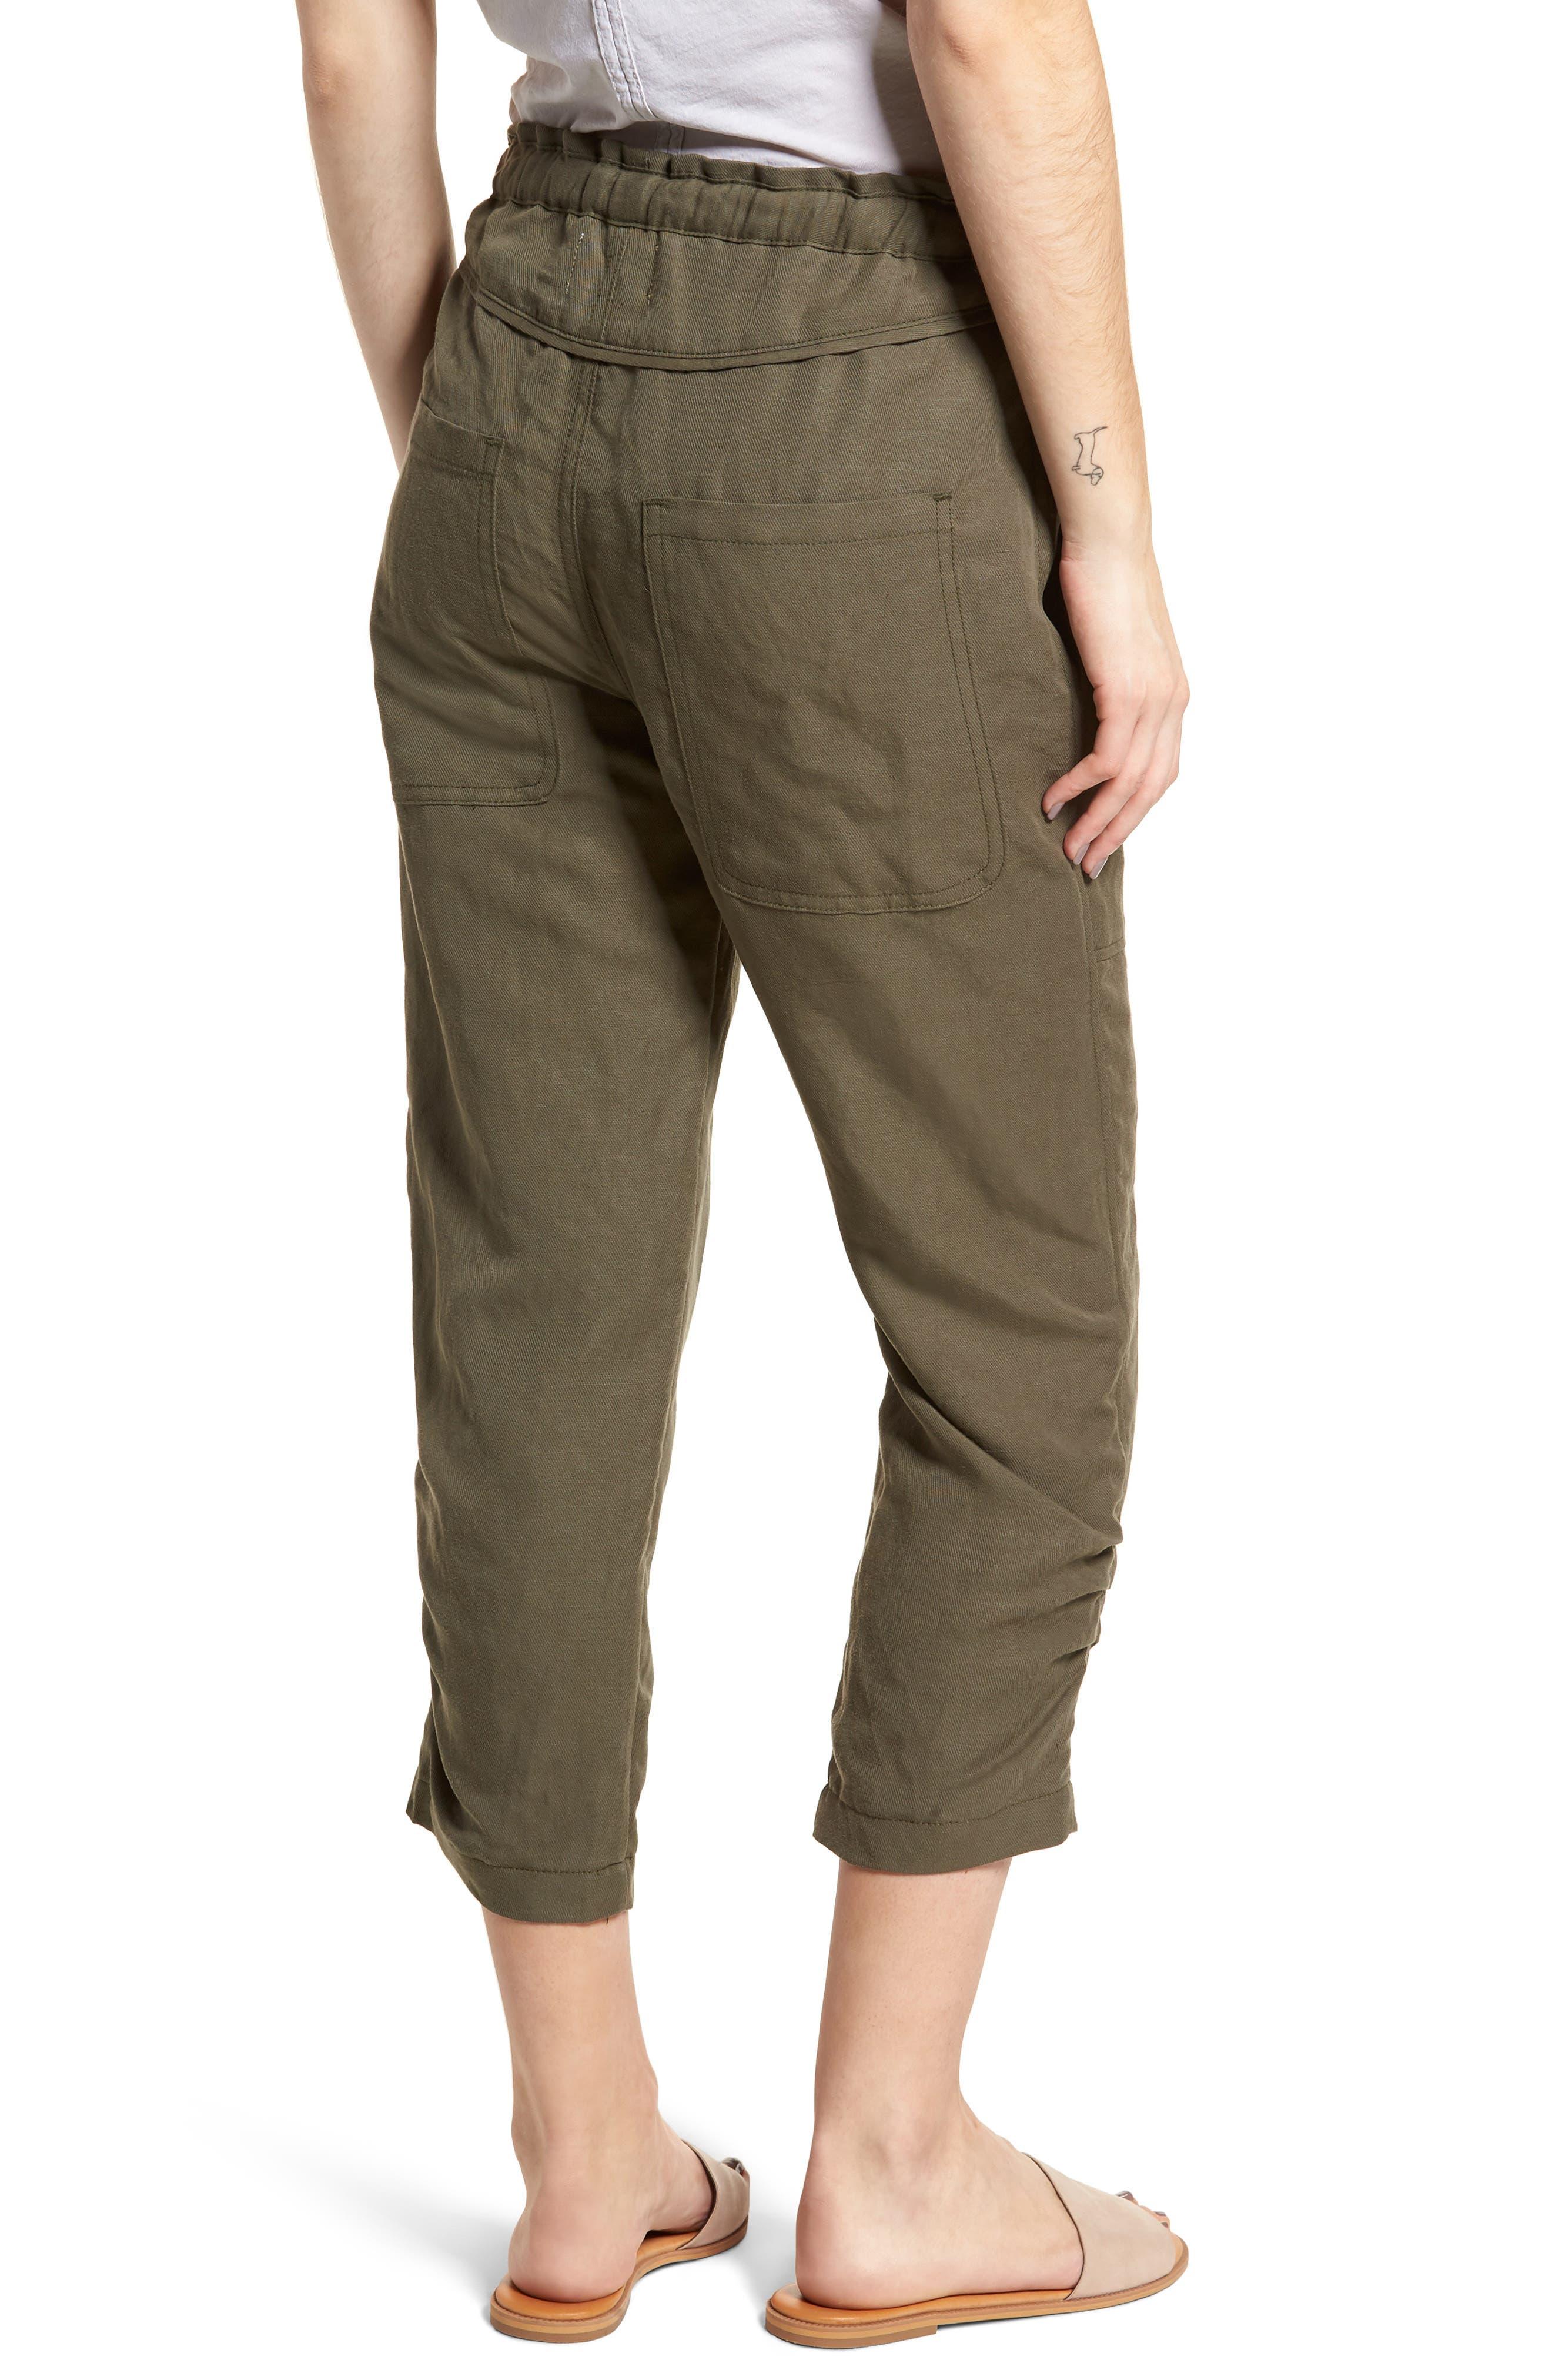 Stellina High Waist Pants,                             Alternate thumbnail 2, color,                             Verdant